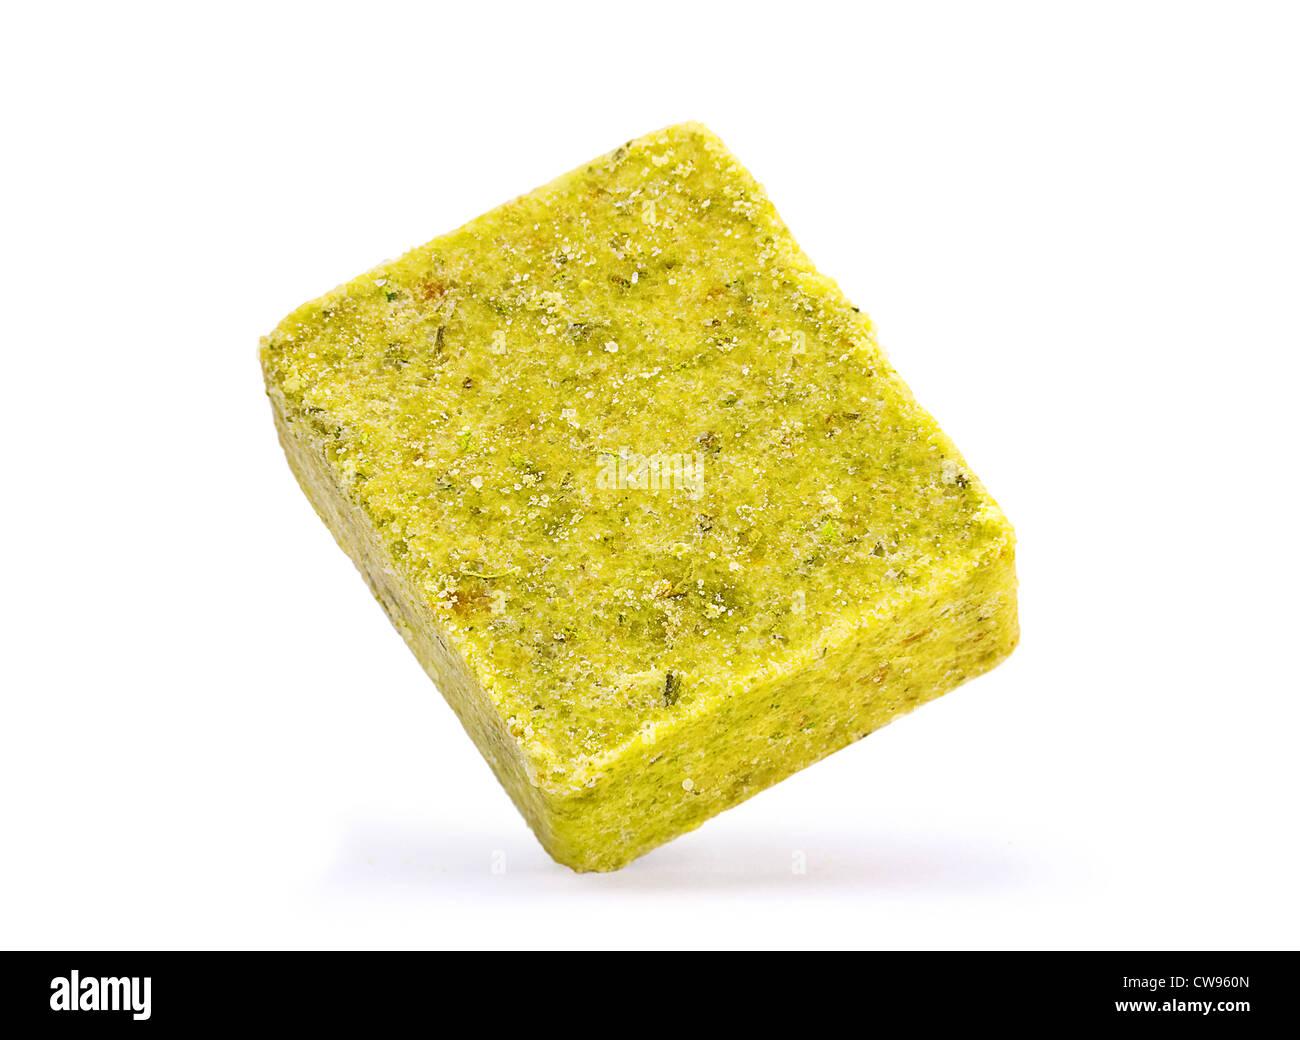 Concentrates chick flavor bouillon cube - Stock Image